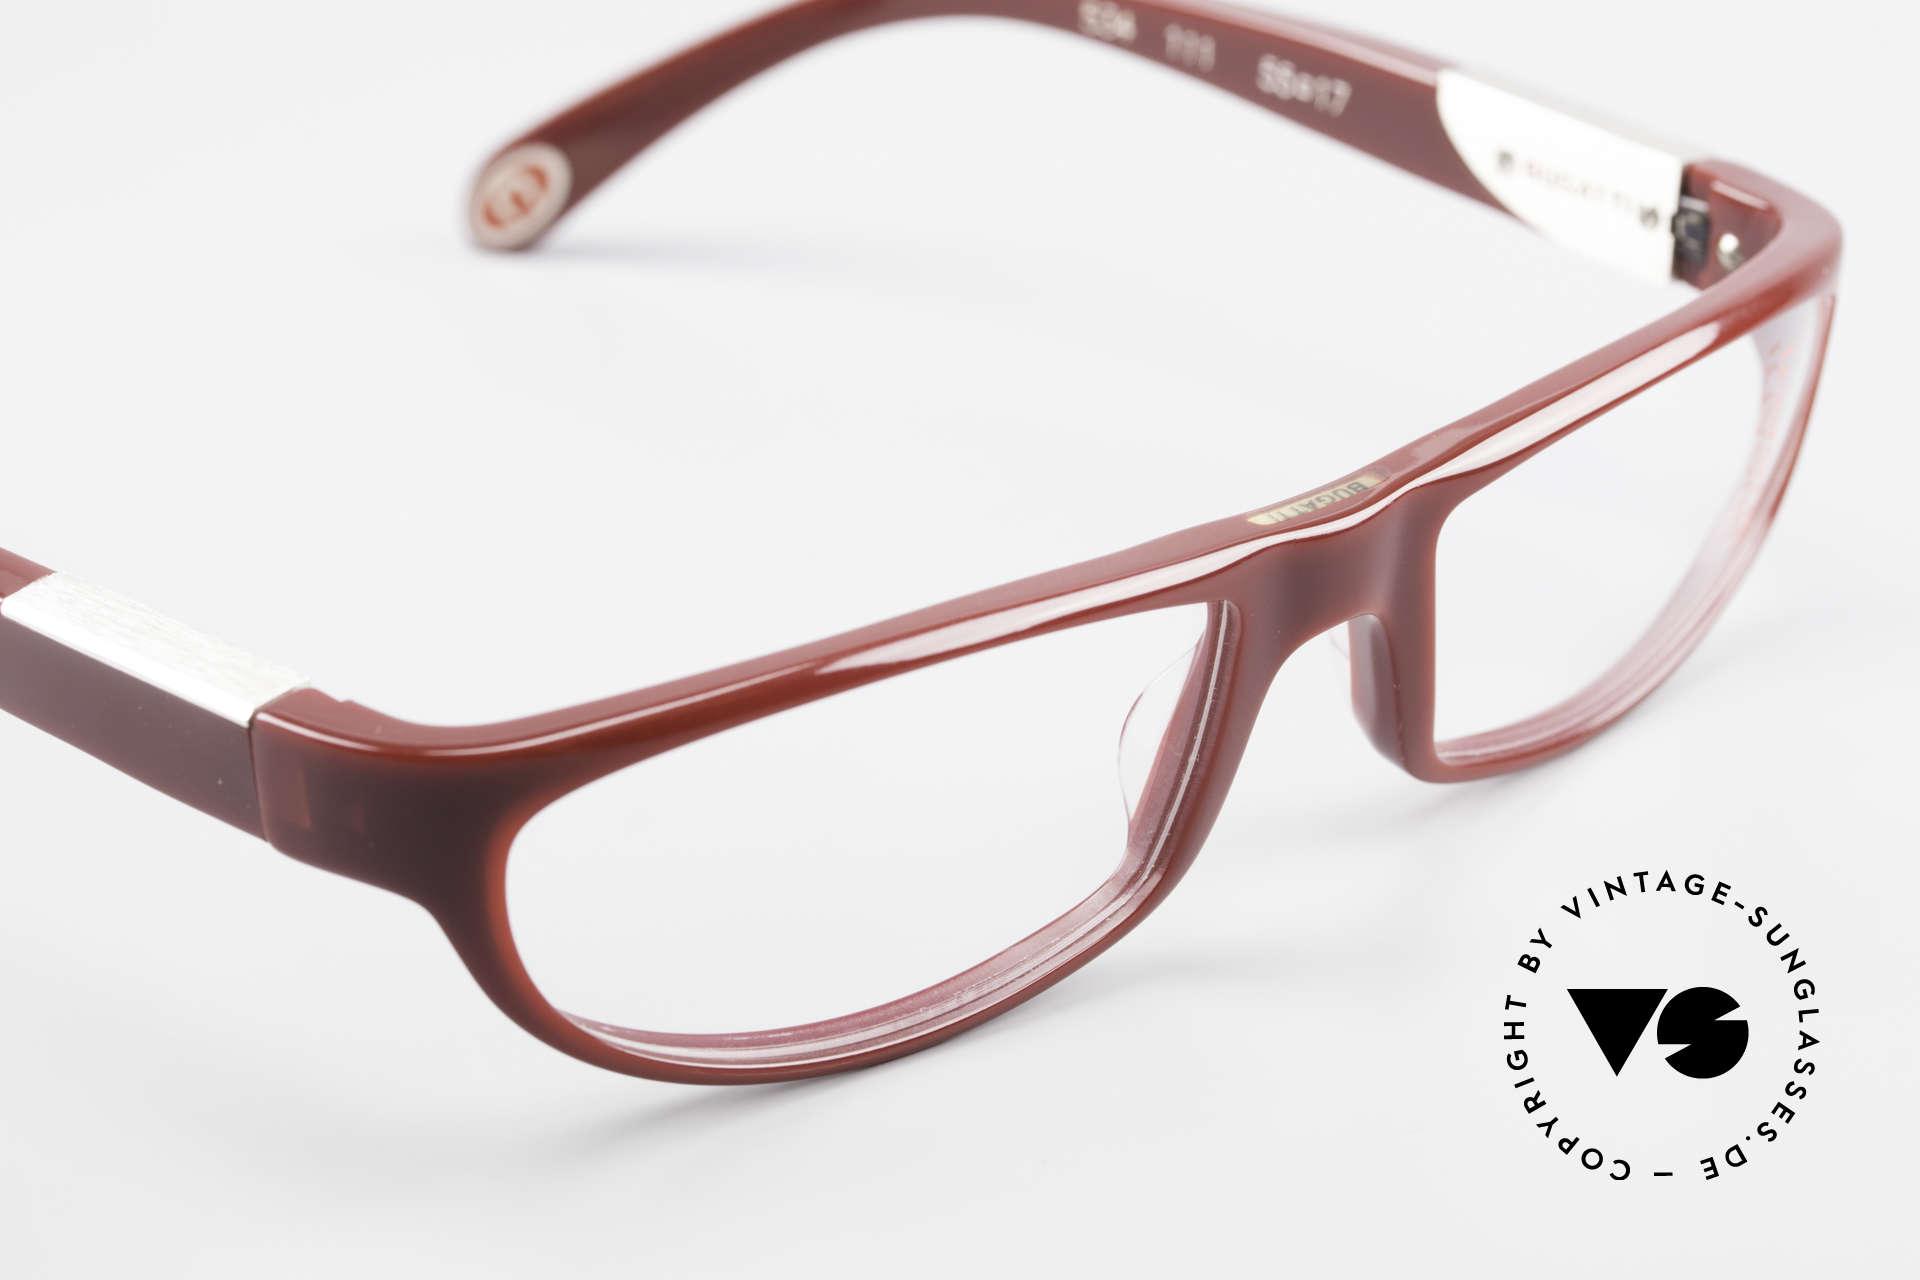 Bugatti 534 Striking Plastic Eyeglass-Frame, unworn model comes with orig. case & packing, Made for Men